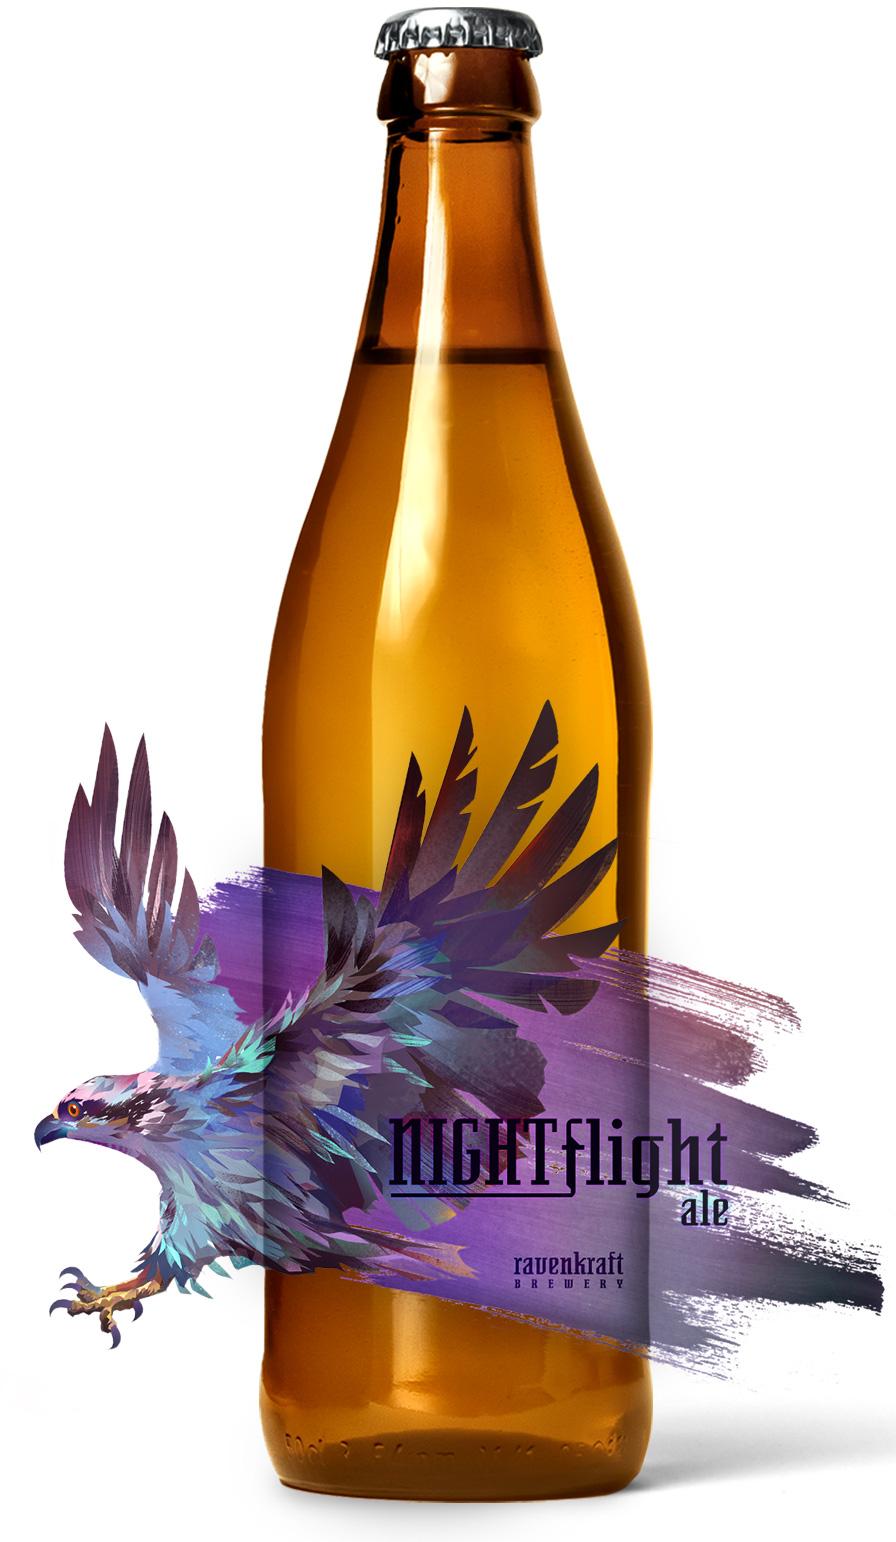 Night Flight Roll Beer Label Printing